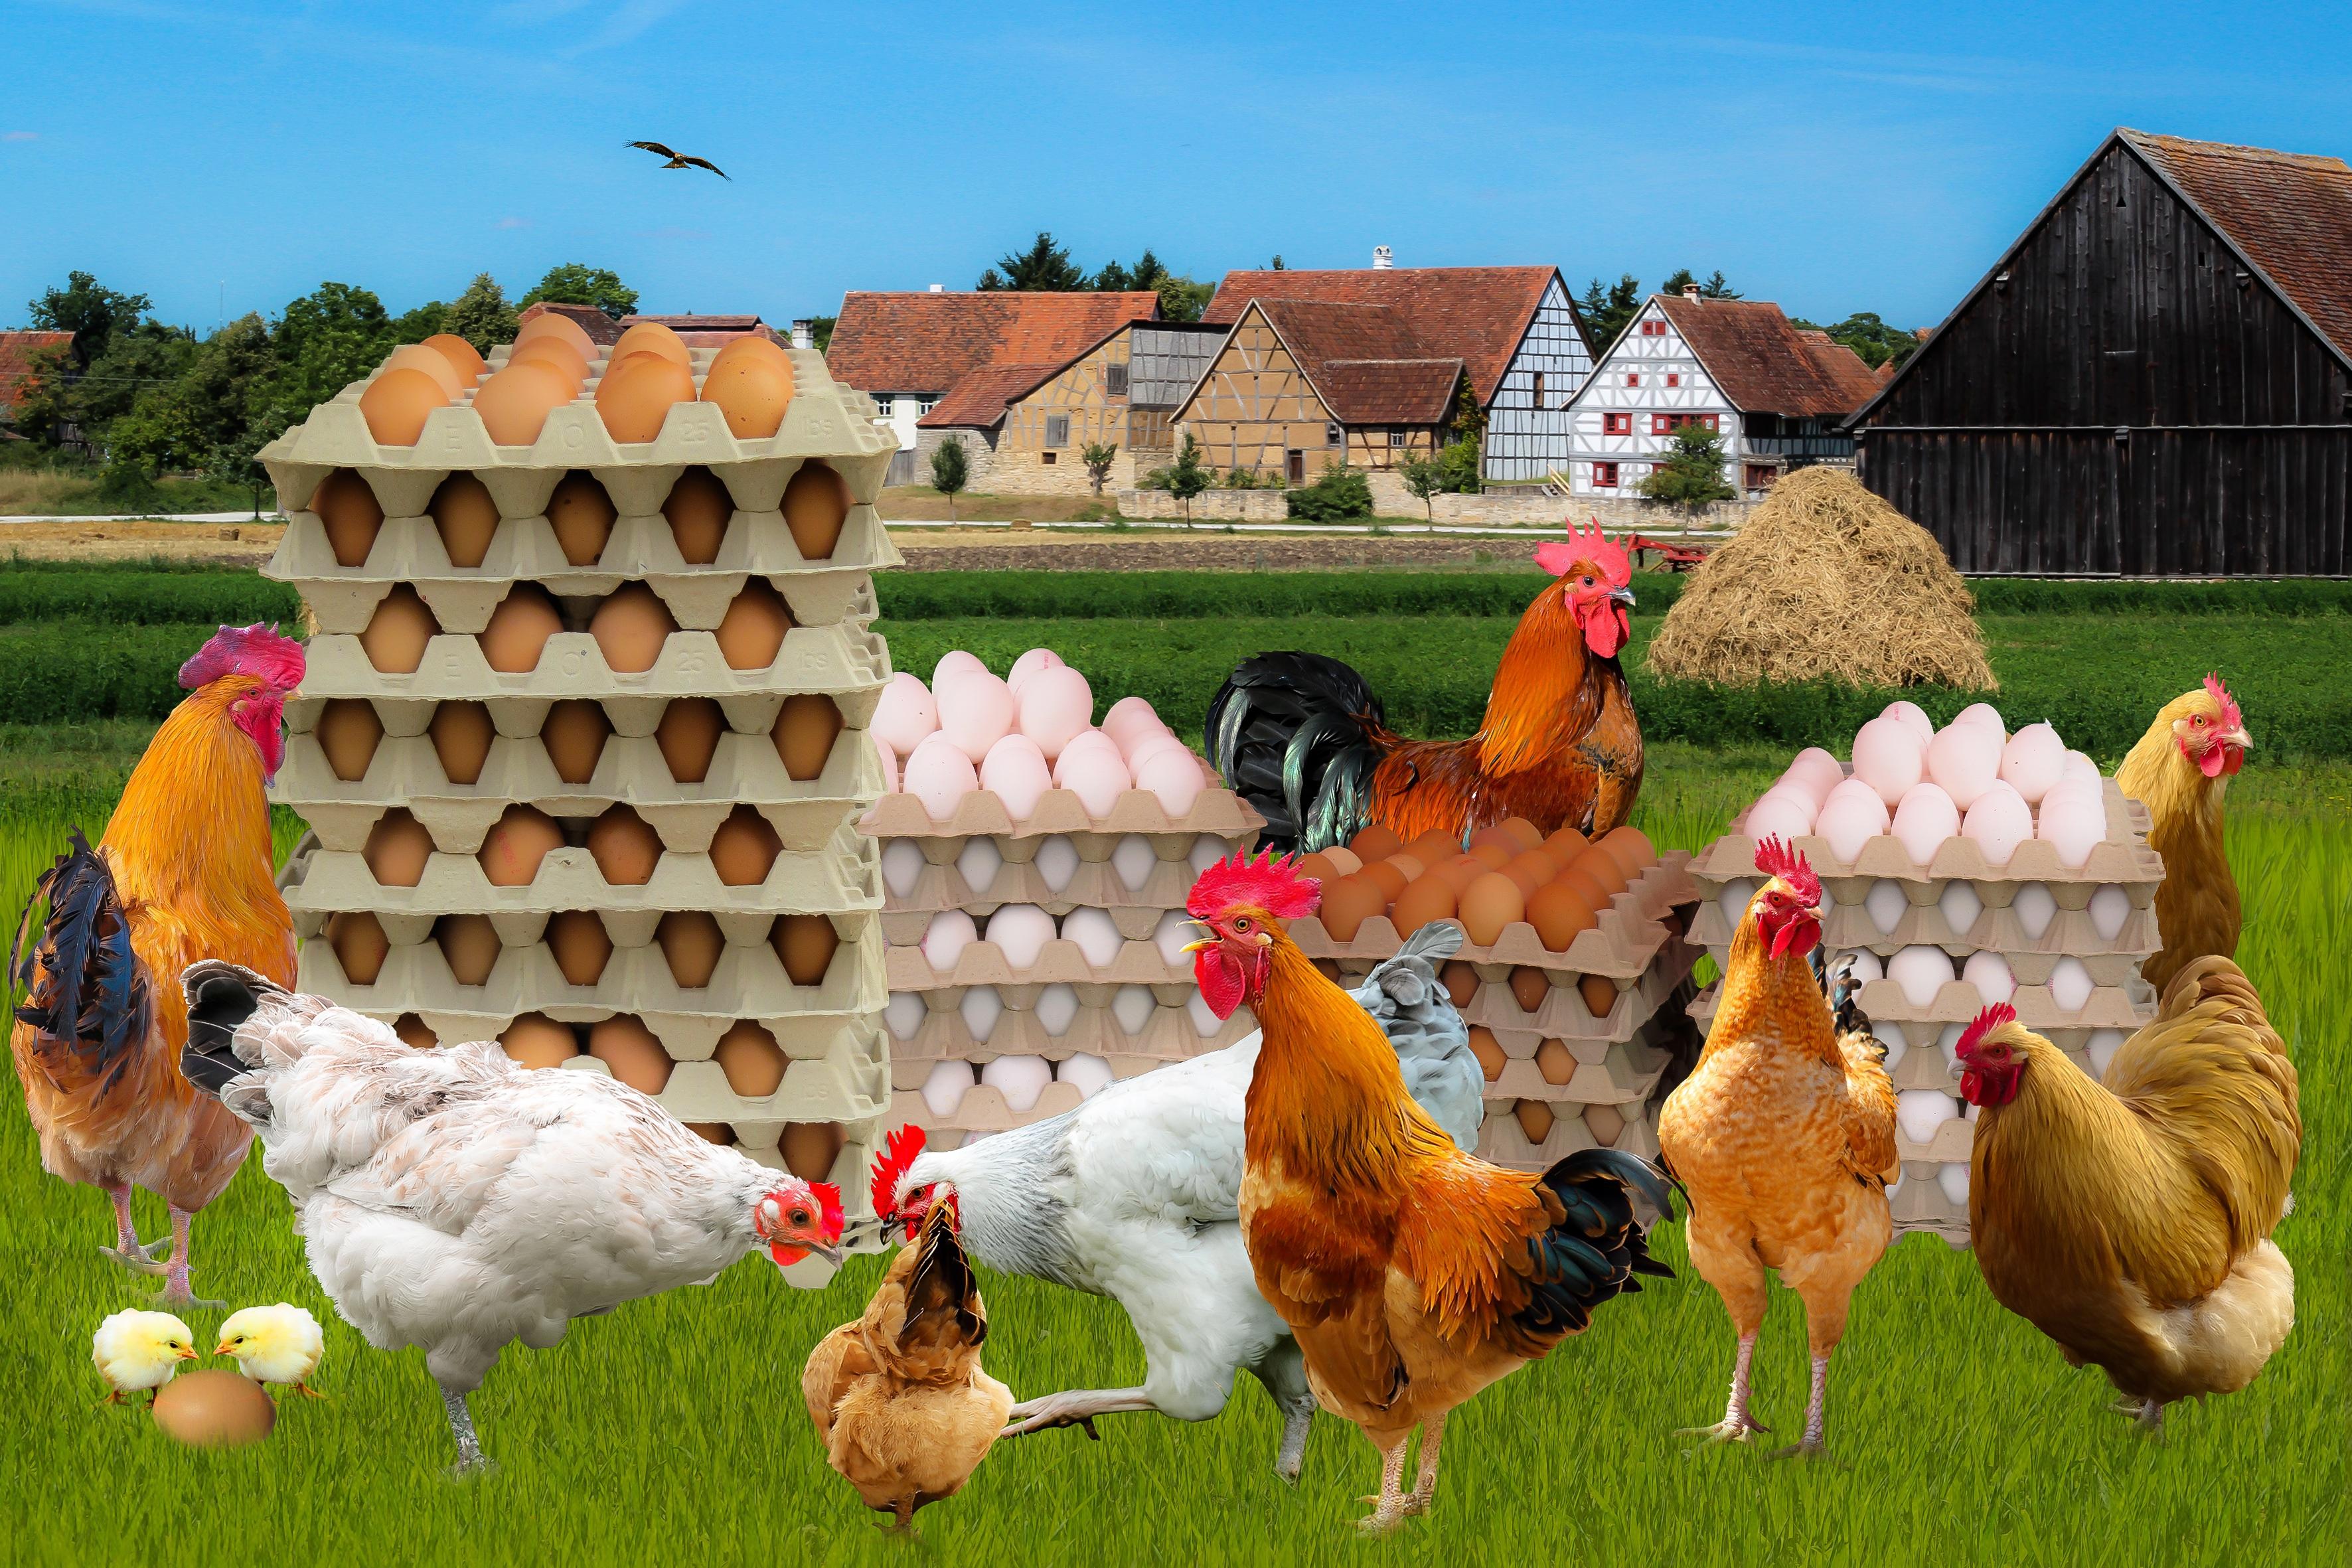 куры на ферме картинка телом политика установлен